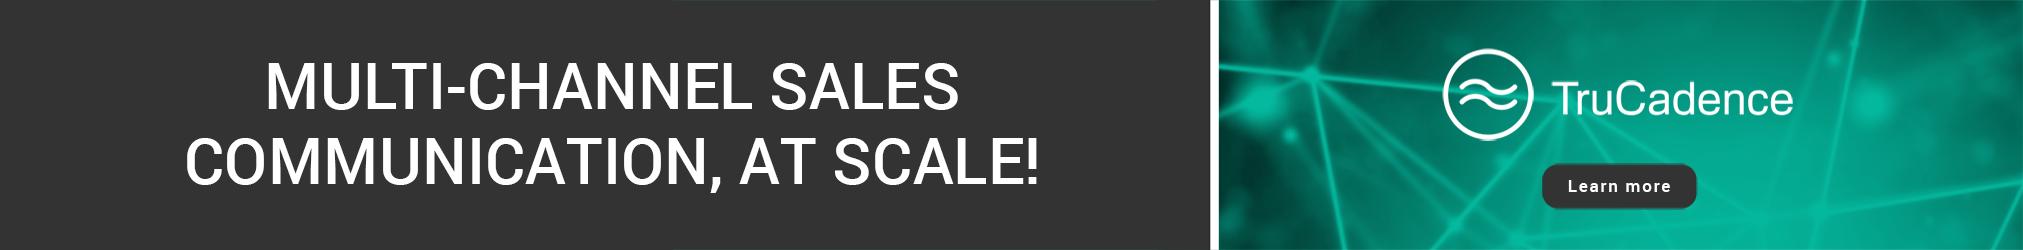 TruCadence_Web_Banner